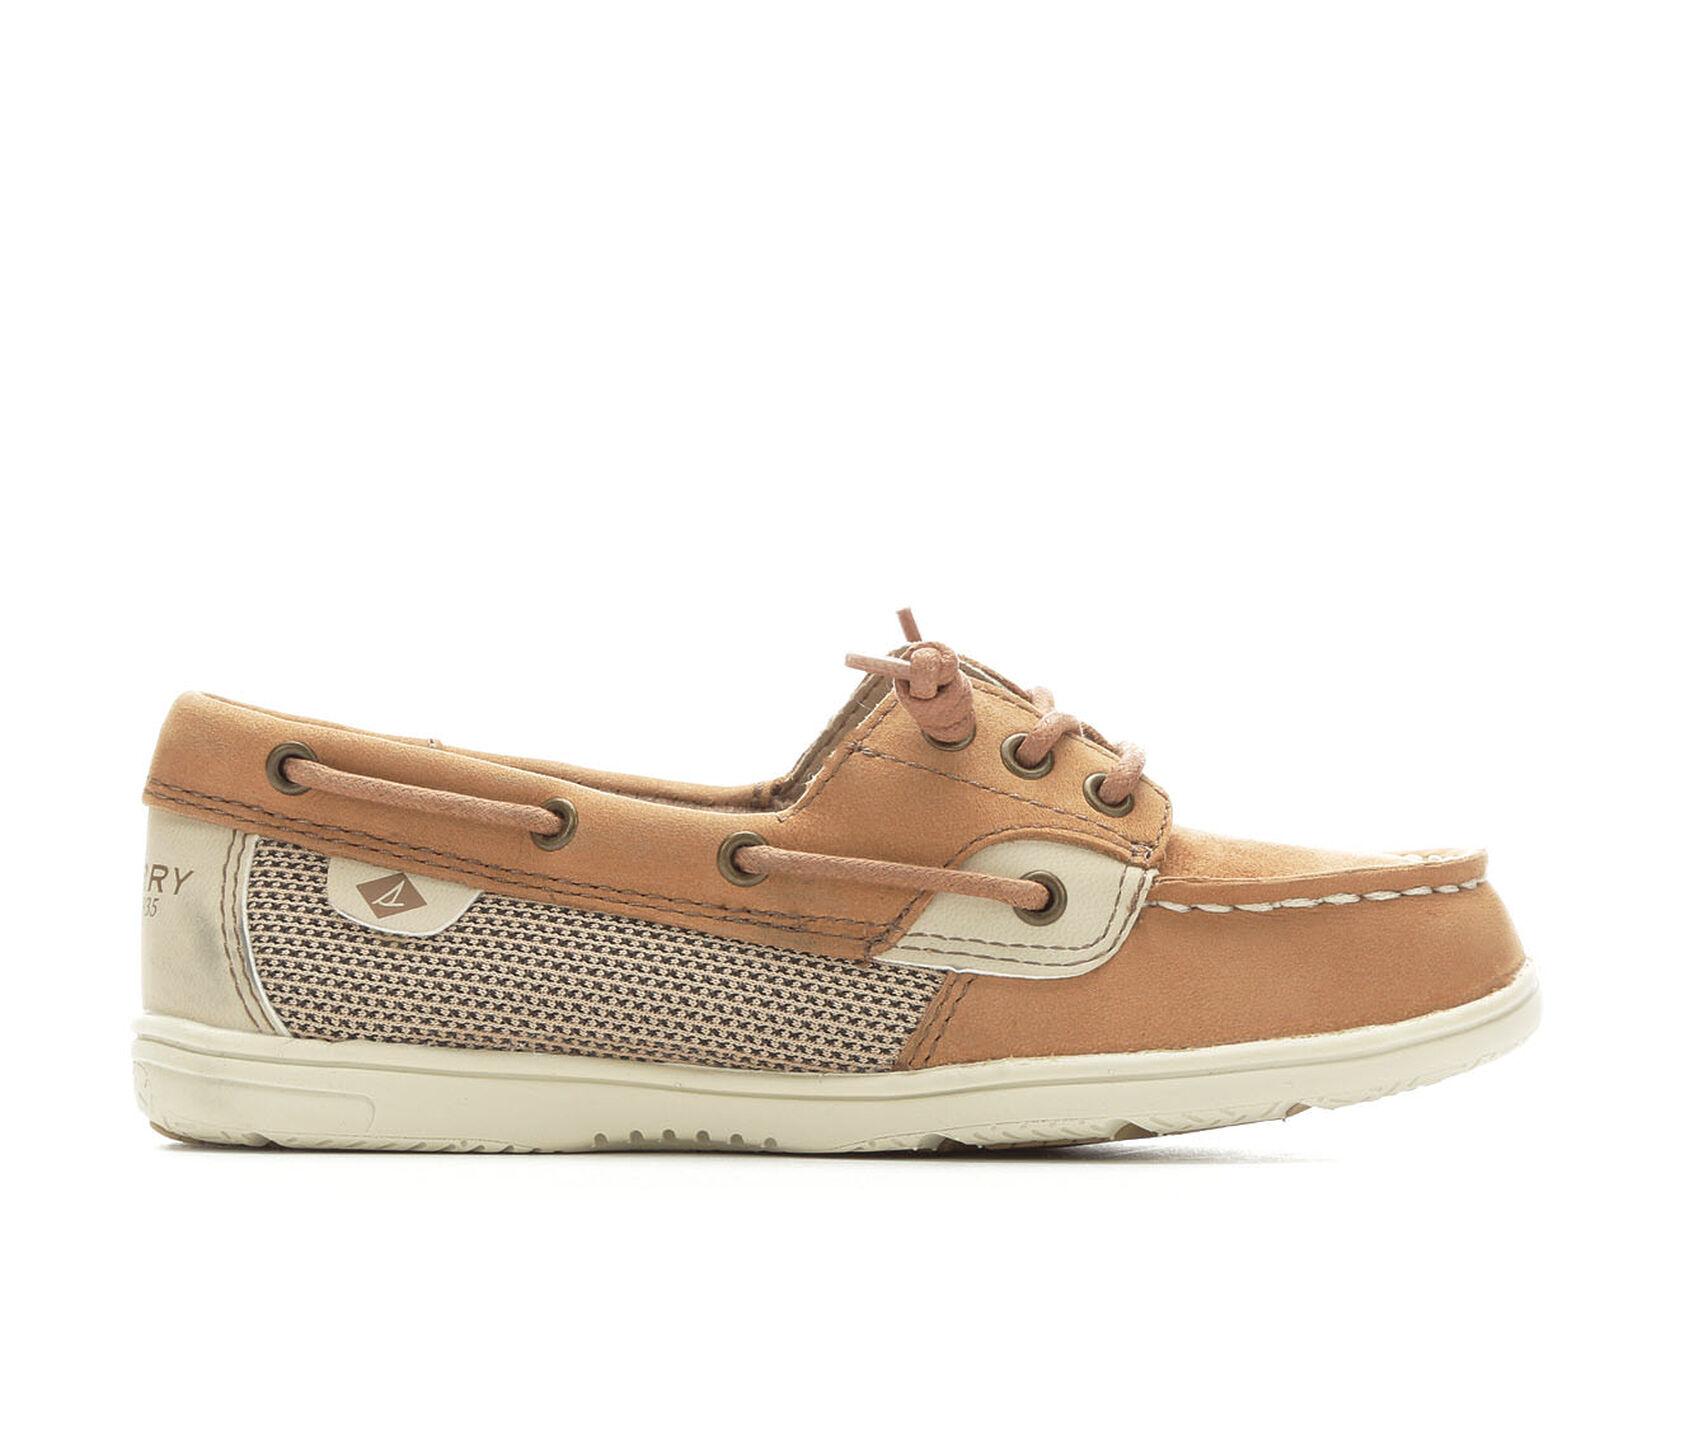 5244c837fcc6 Kids' Sperry Little Kid & Big Kid Shoresider 3 Eye Boat Shoes | Shoe ...